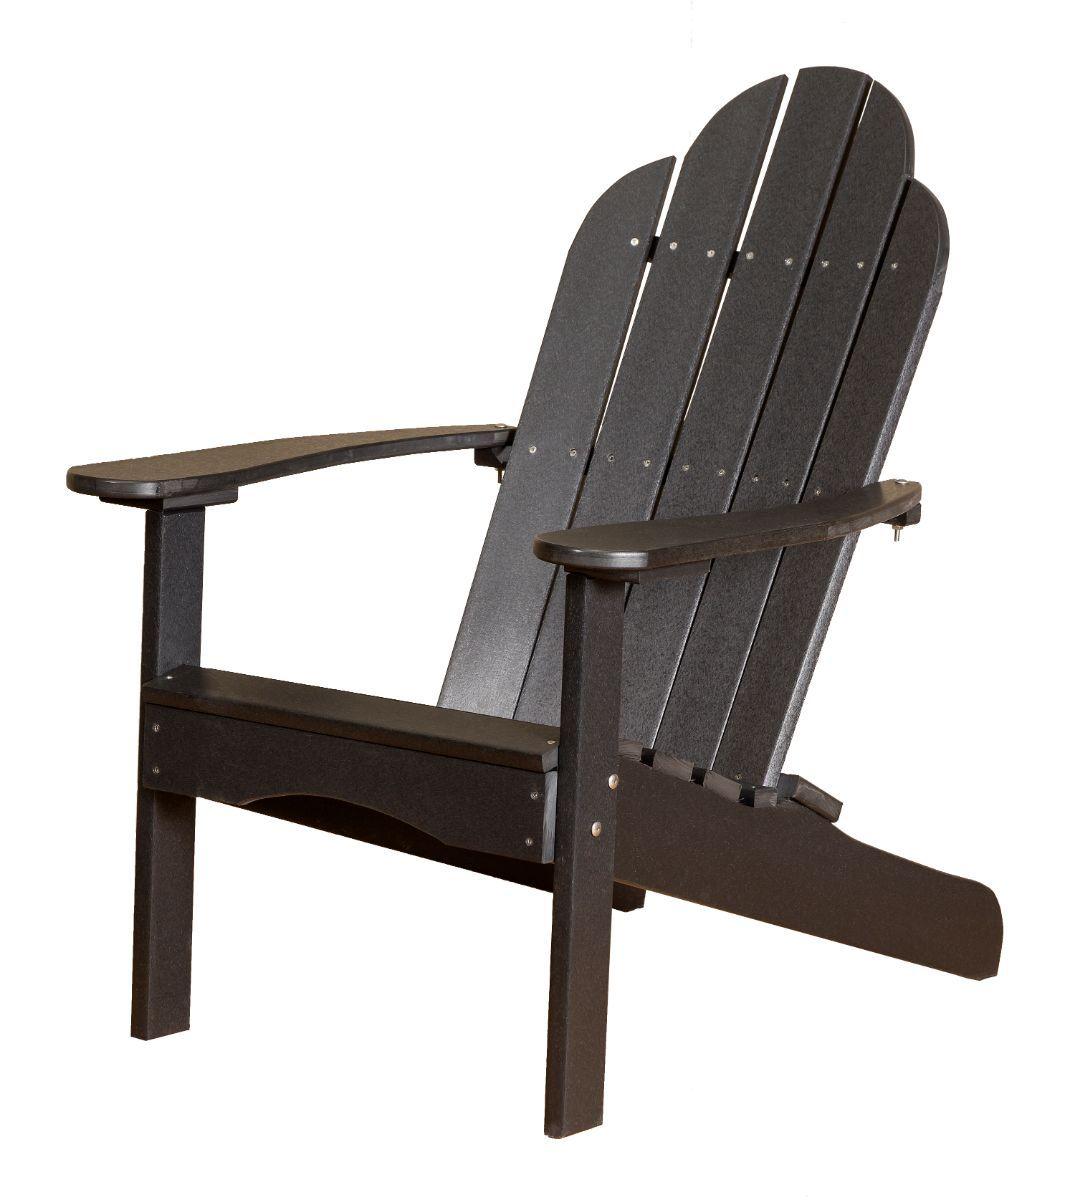 Black Odessa Adirondack Chair